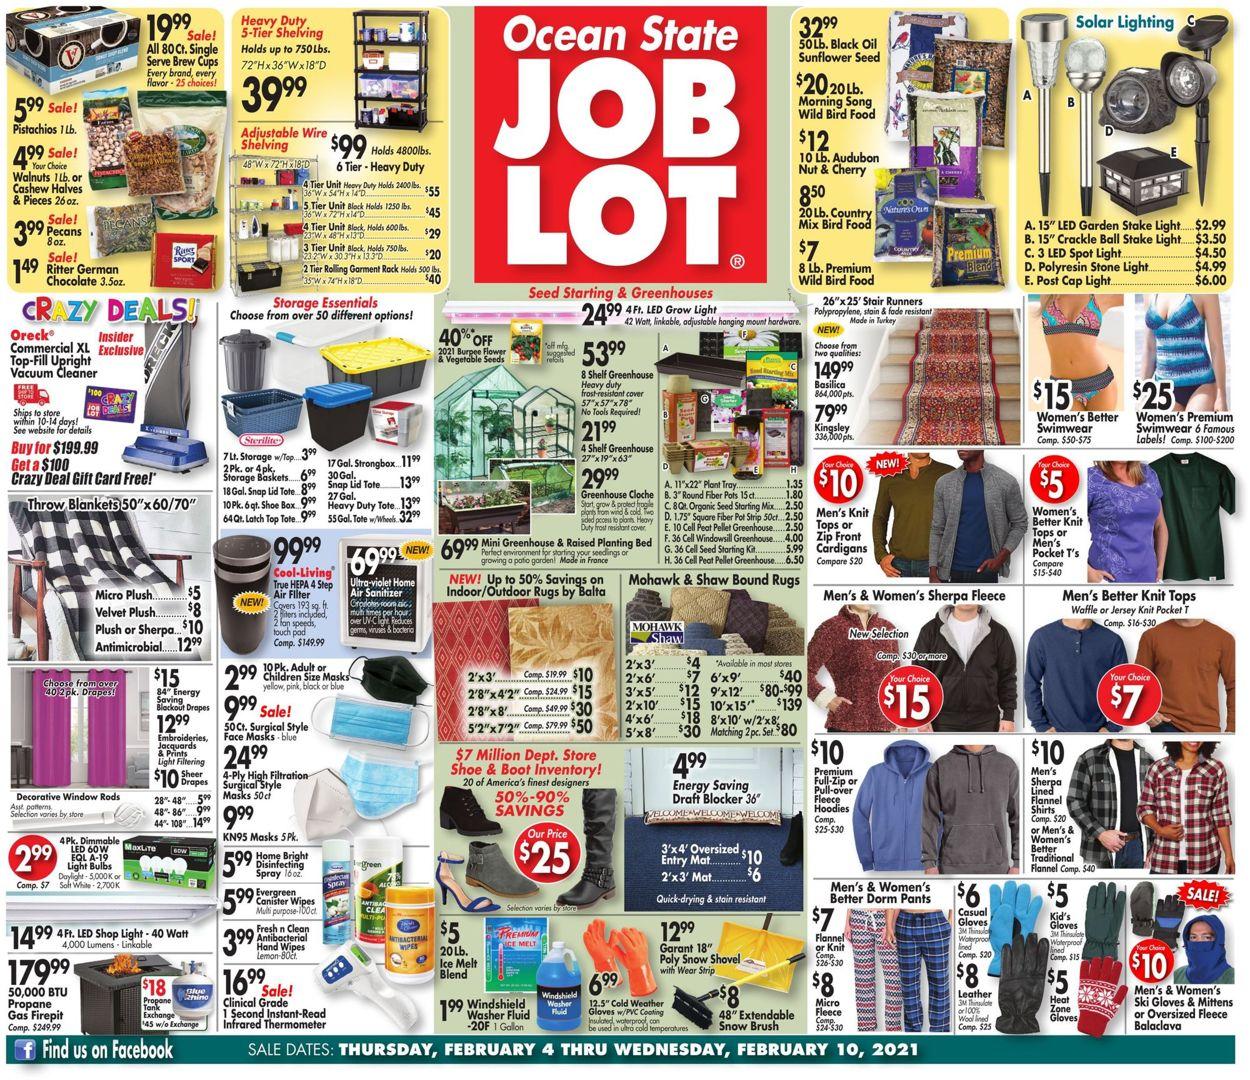 Ocean State Job Lot Weekly Ad Circular - valid 02/04-02/10/2021